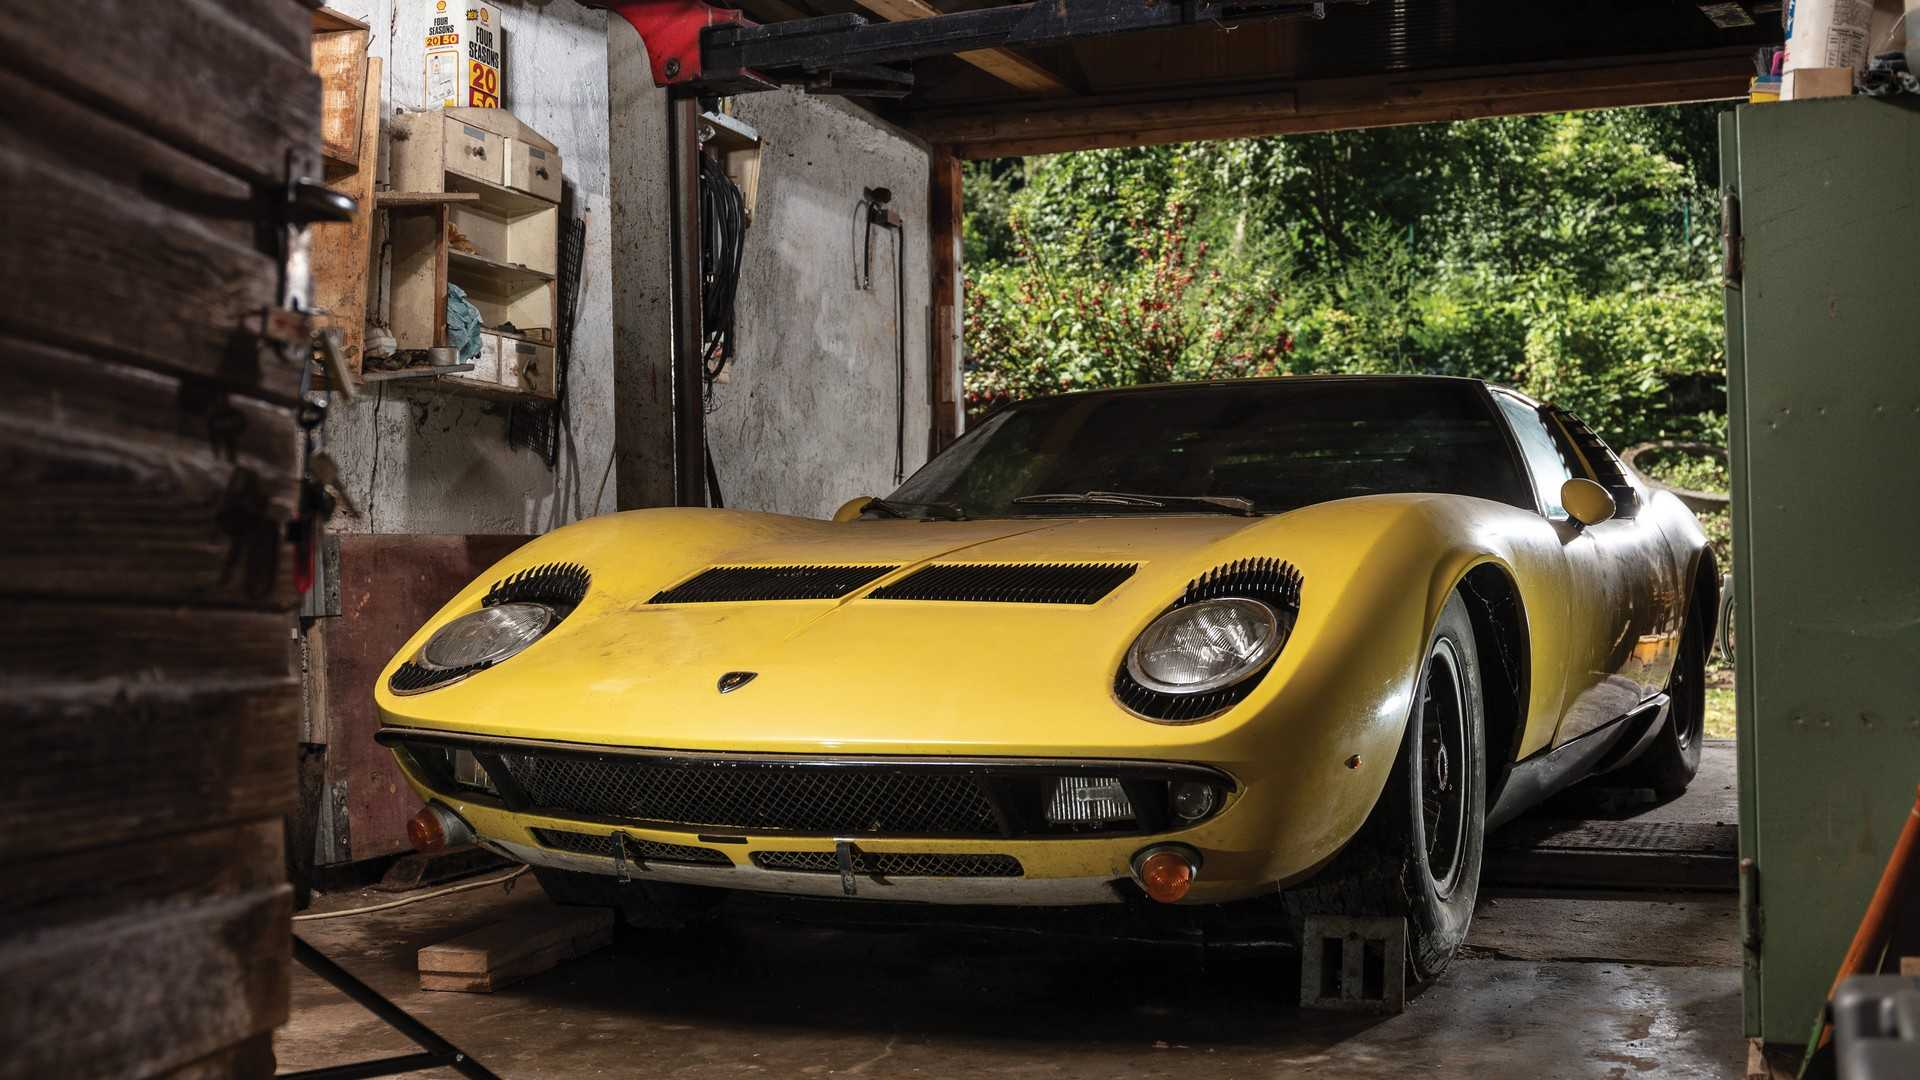 Une Lamborghini Miura dans son jus adjugée 1,45 million d'euros